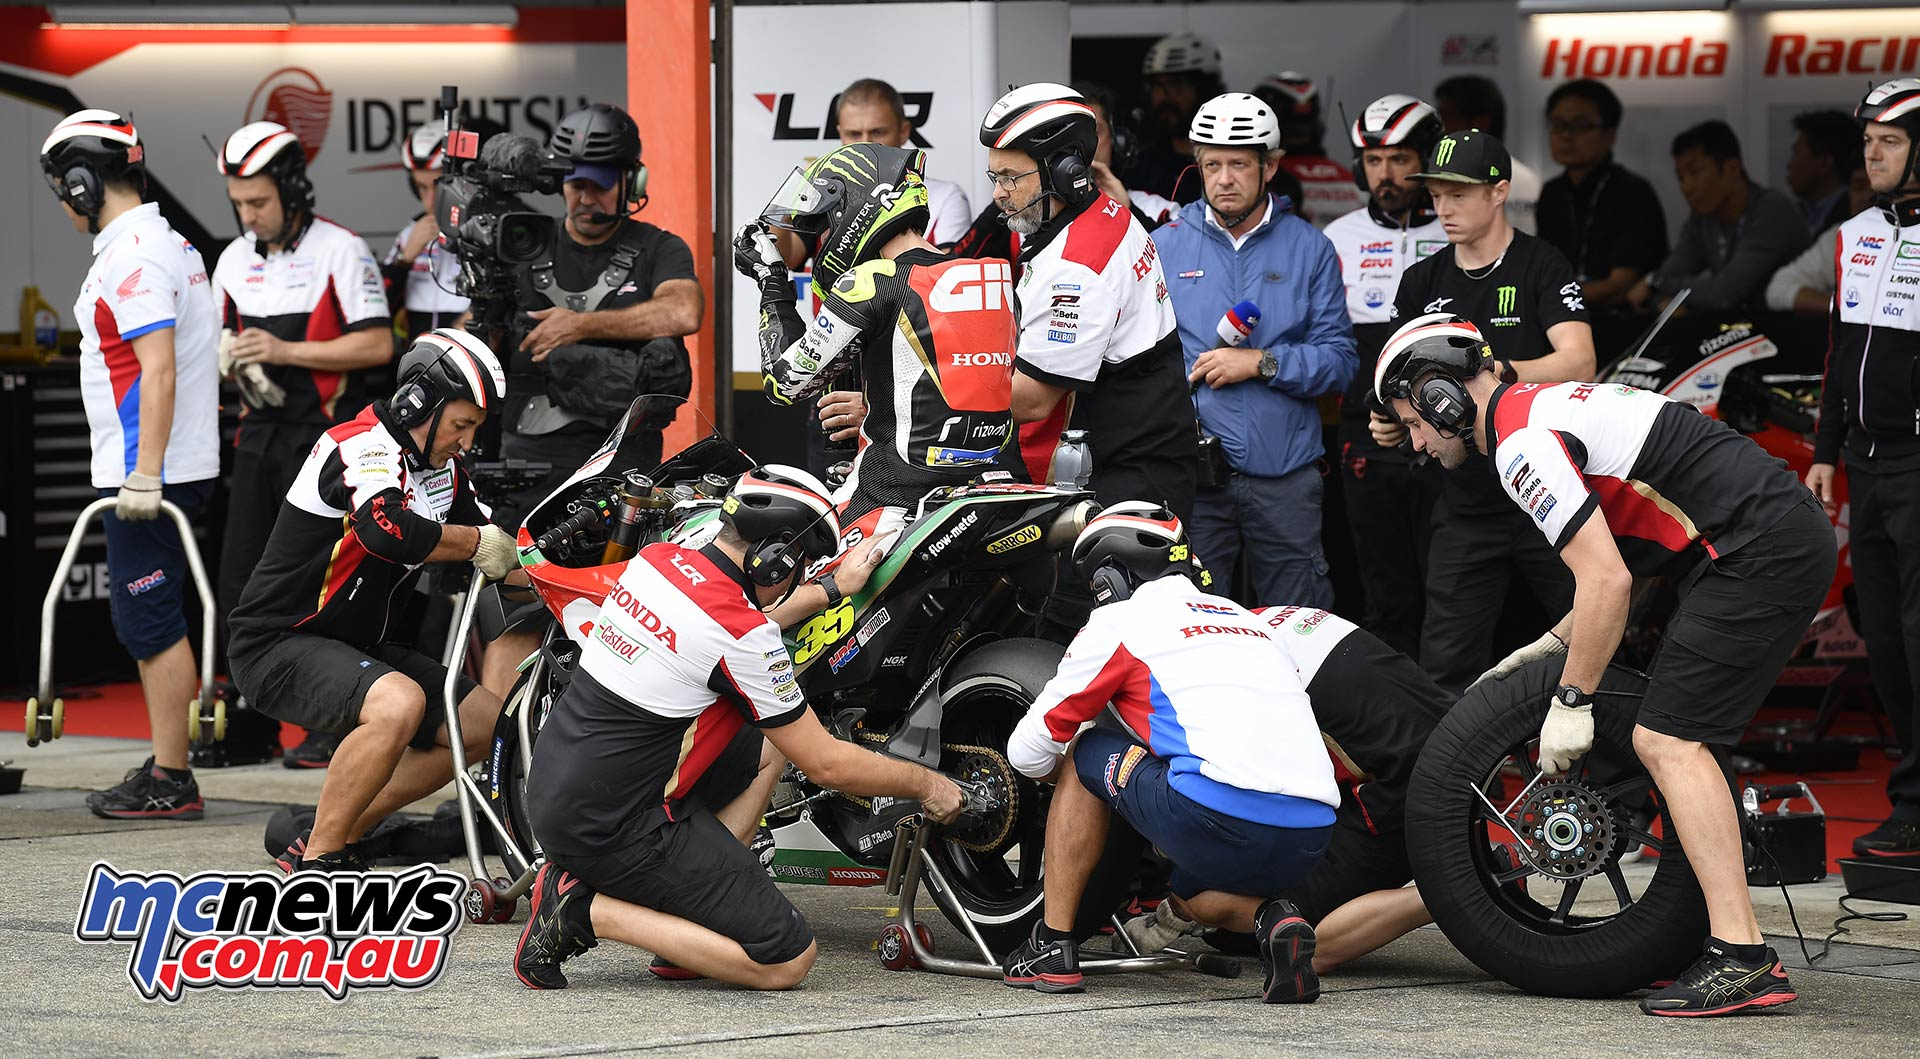 MotoGP Motegi Sat Crutchlow